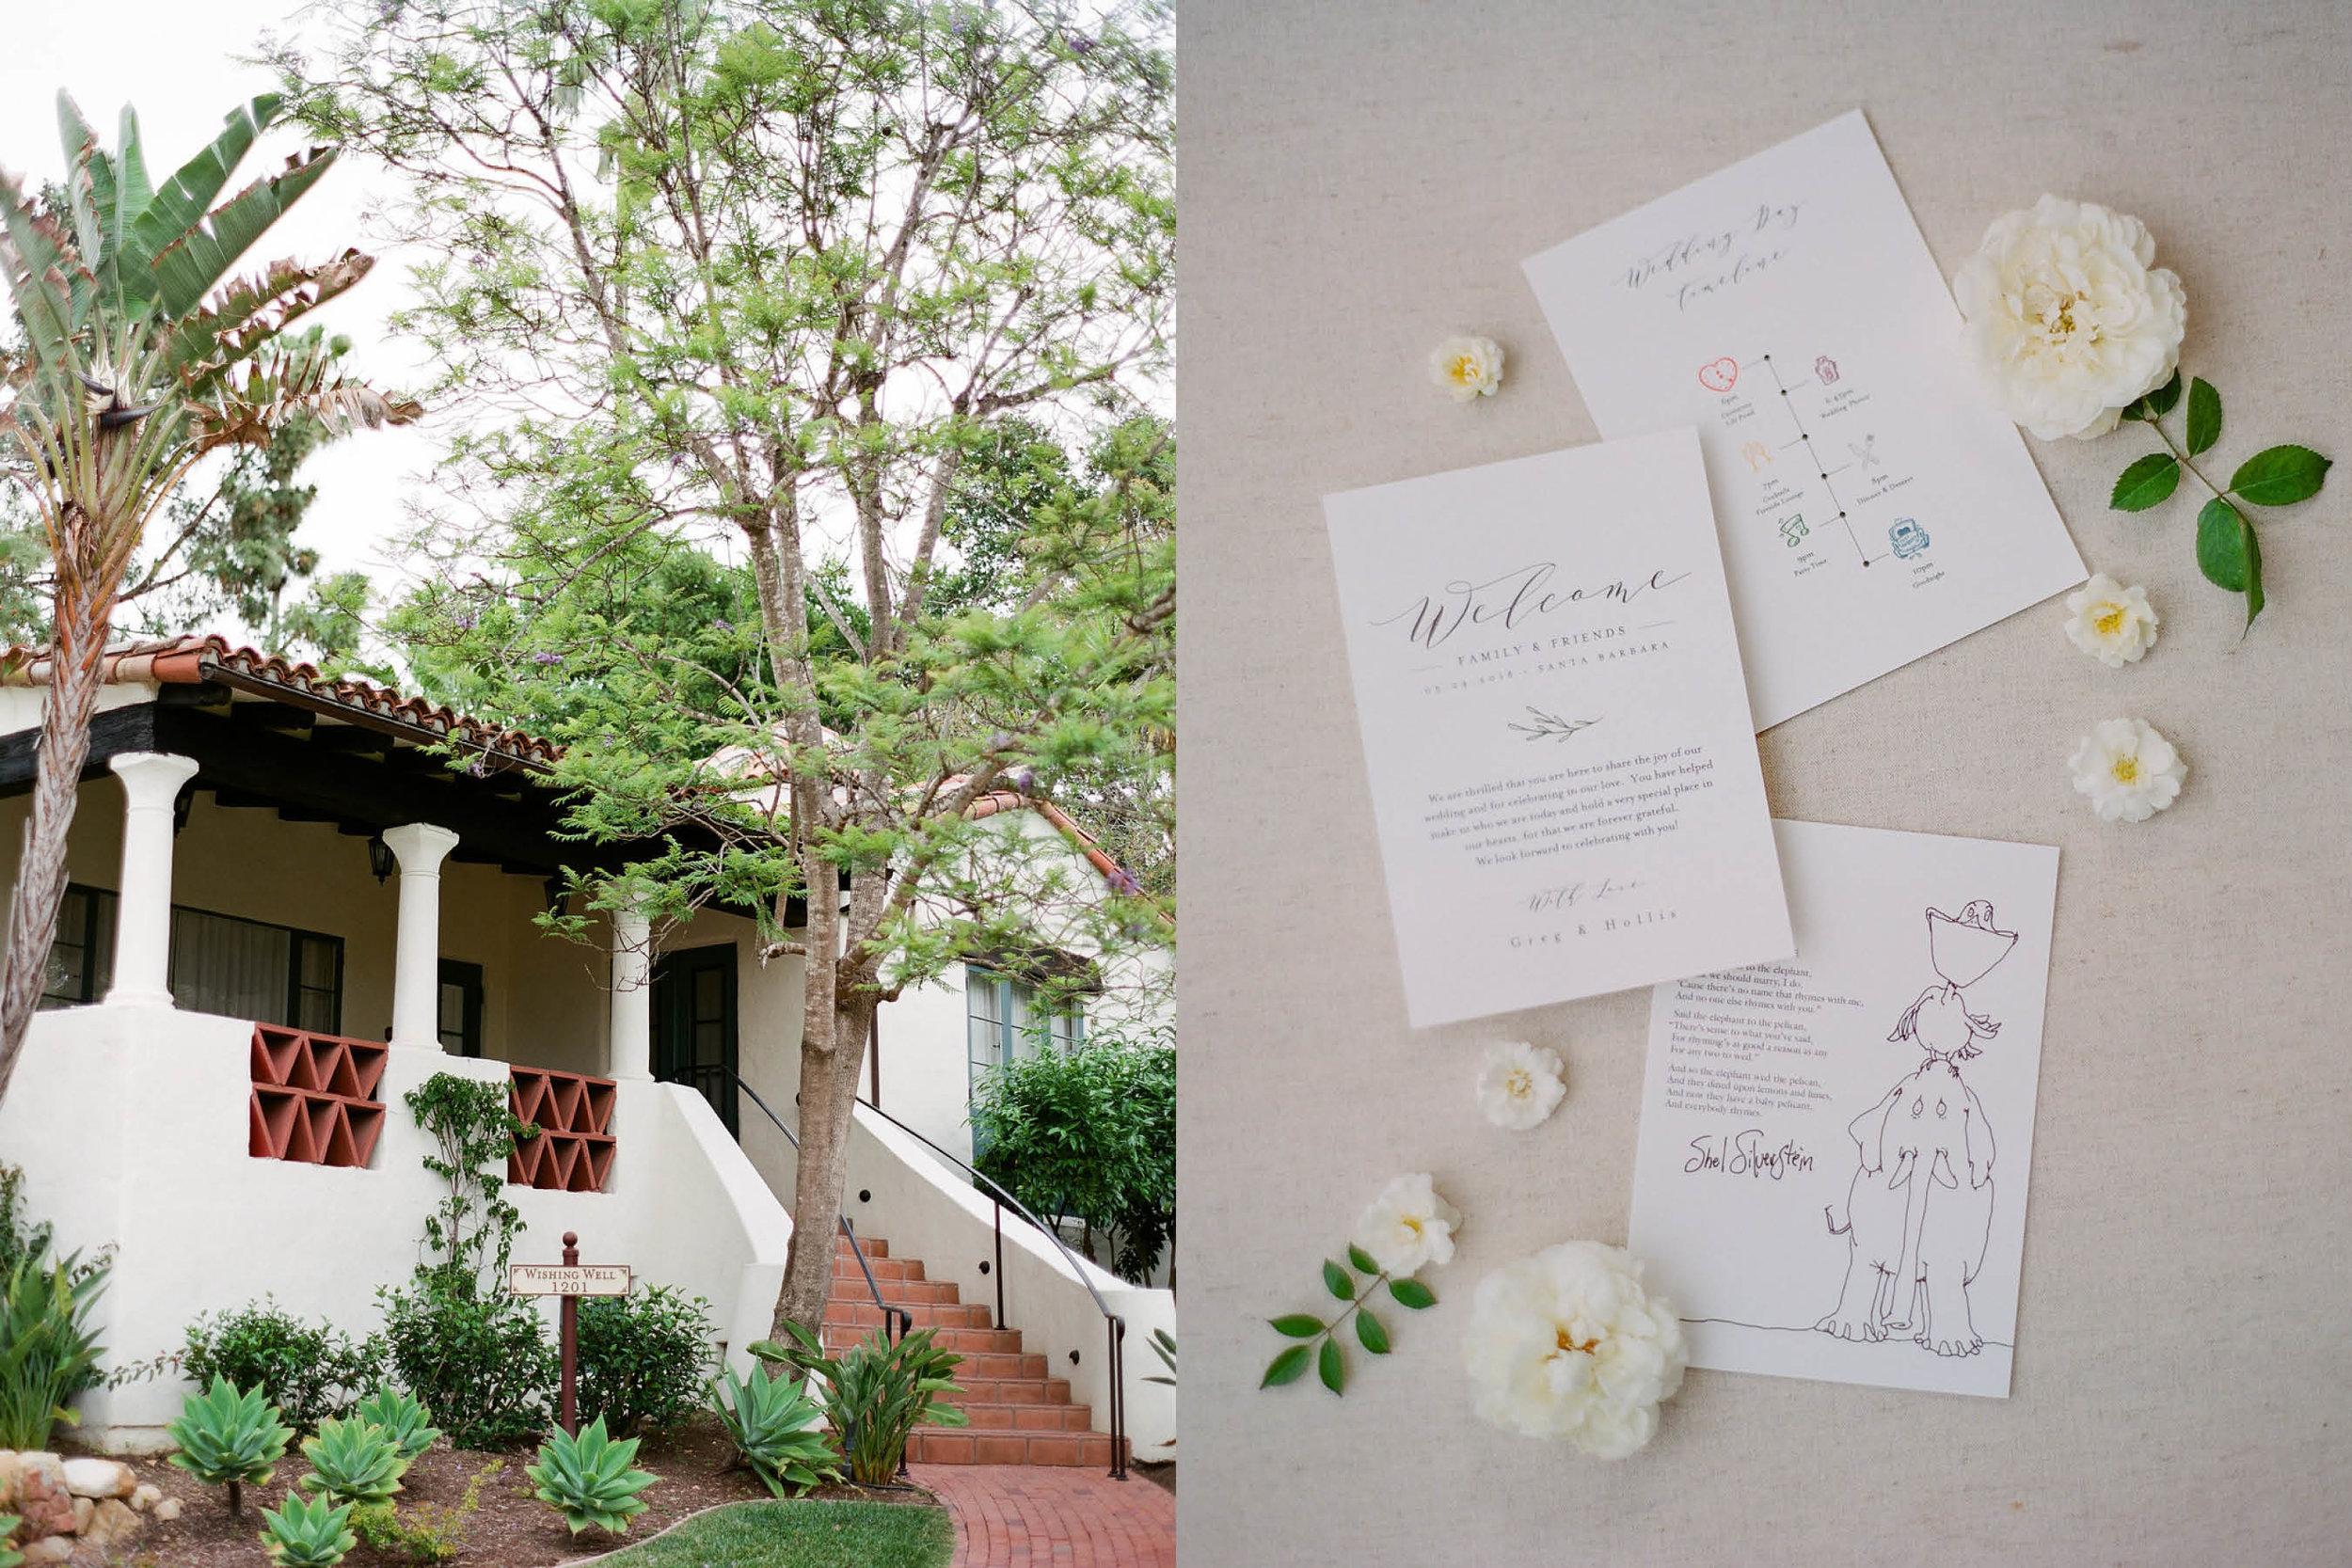 santa-barbara-elopement-wedding-planning-planner-coordinator-day-of-week-small-wedding-el-encanto-lily-pond-pink-kids-garden-riviera-elope-design-estate-candle (2).jpg